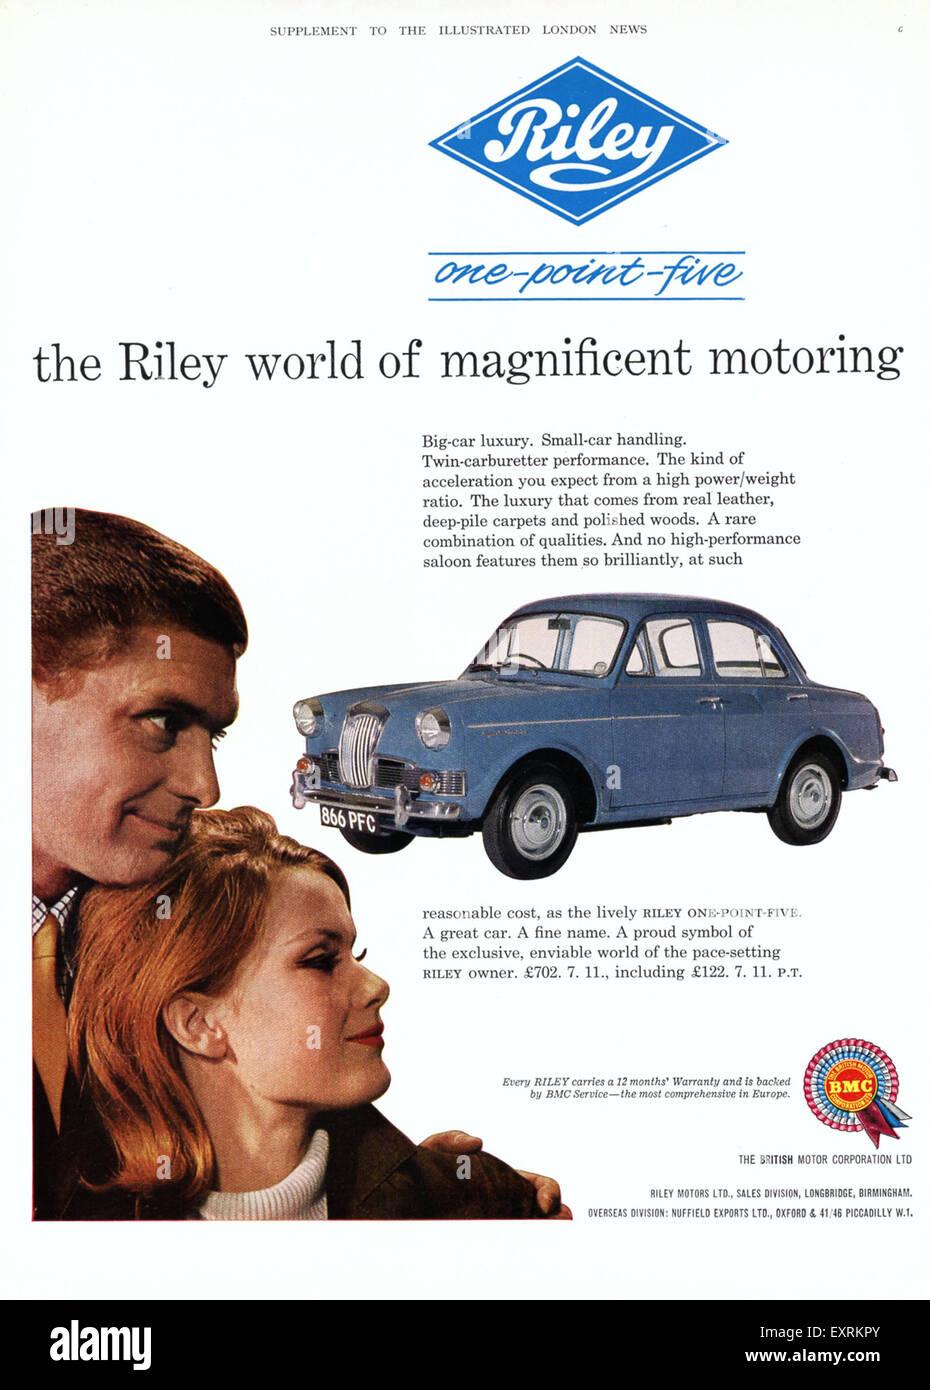 1960s UK Riley Magazine Advert - Stock Image